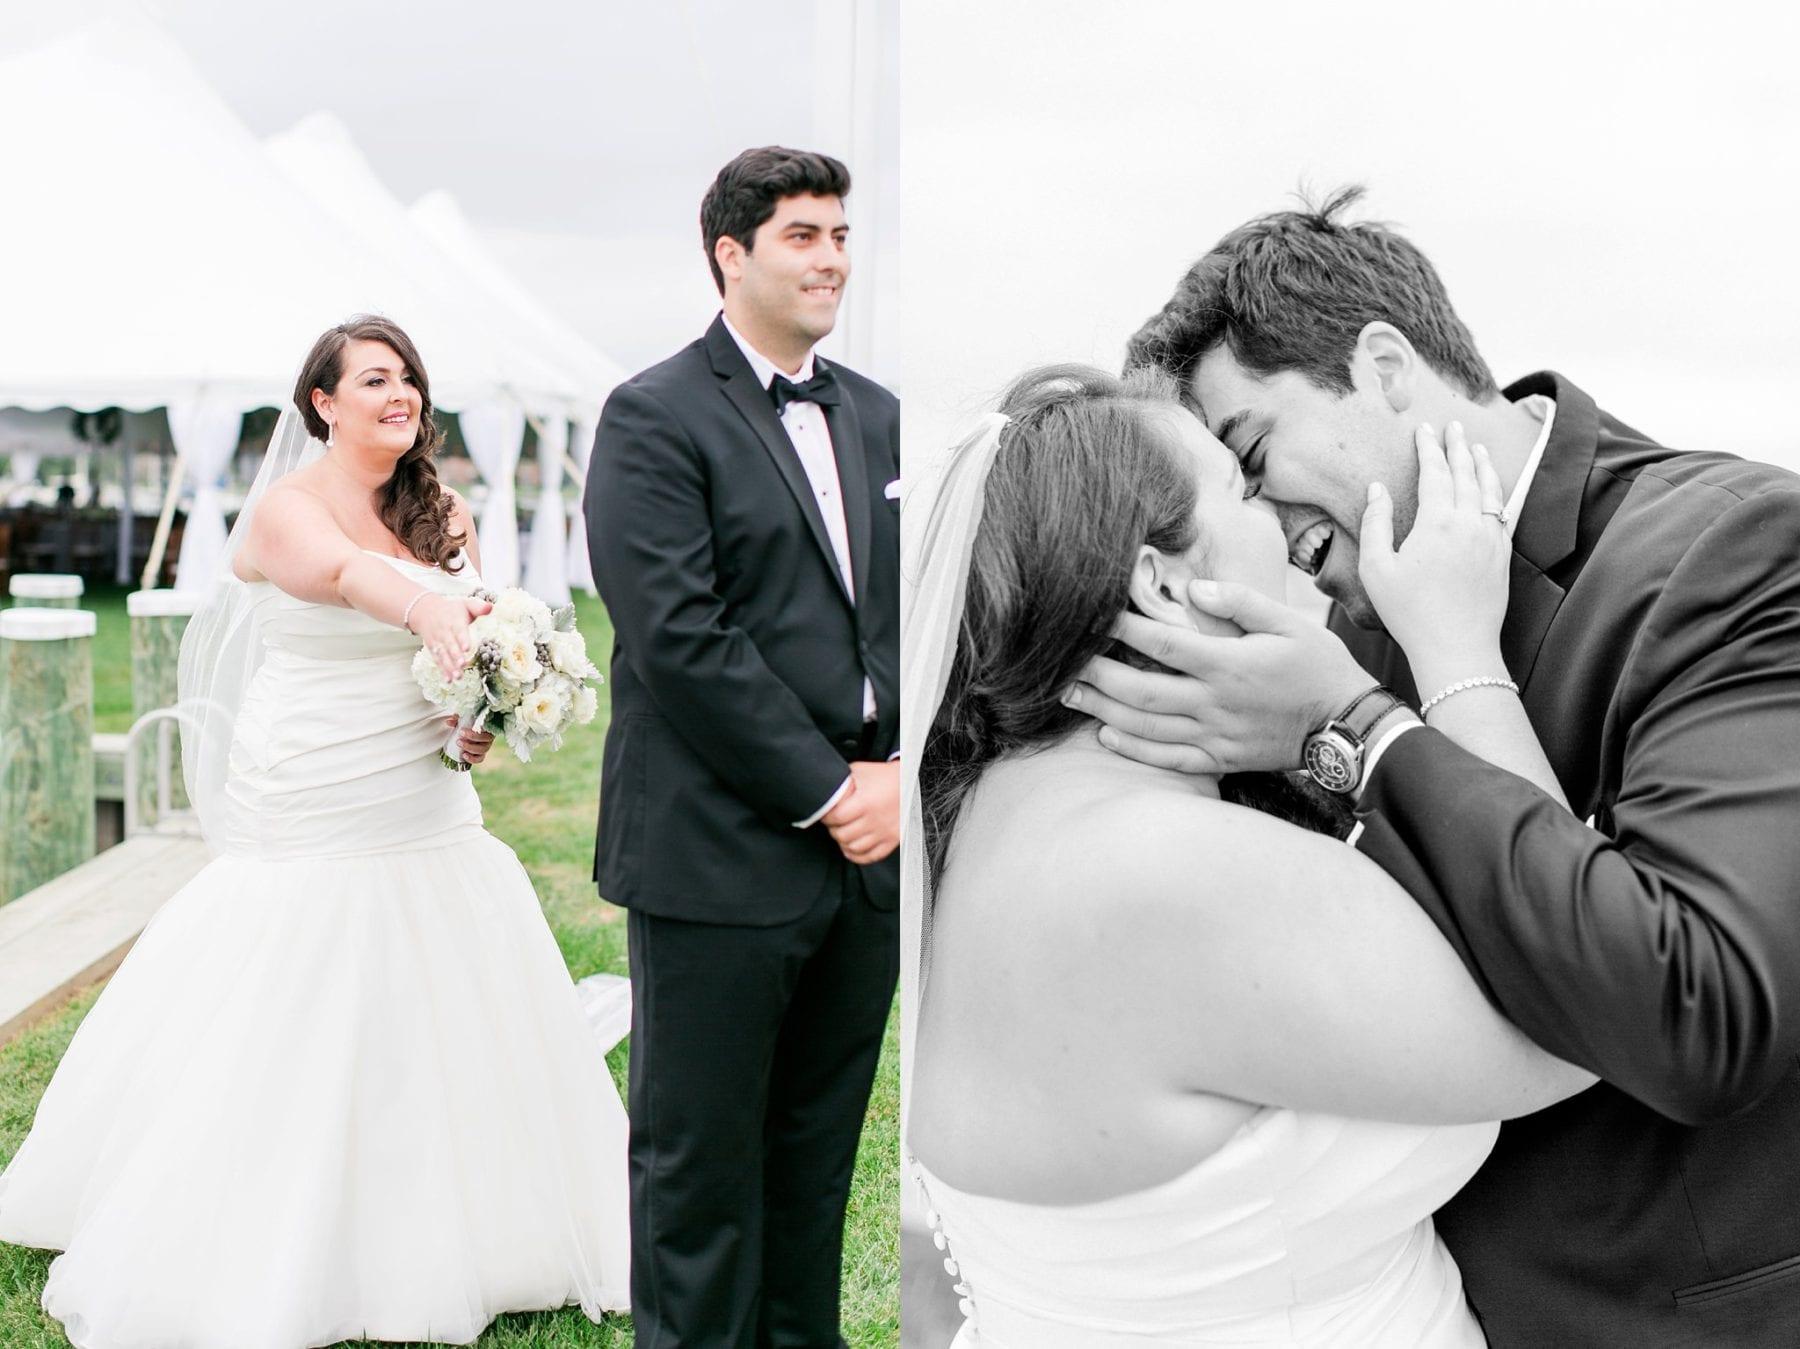 Chesapeake Bay Maritime Museum Wedding Photos Maryland Wedding Photographer Megan Kelsey Photography Halie & Mike-44.jpg